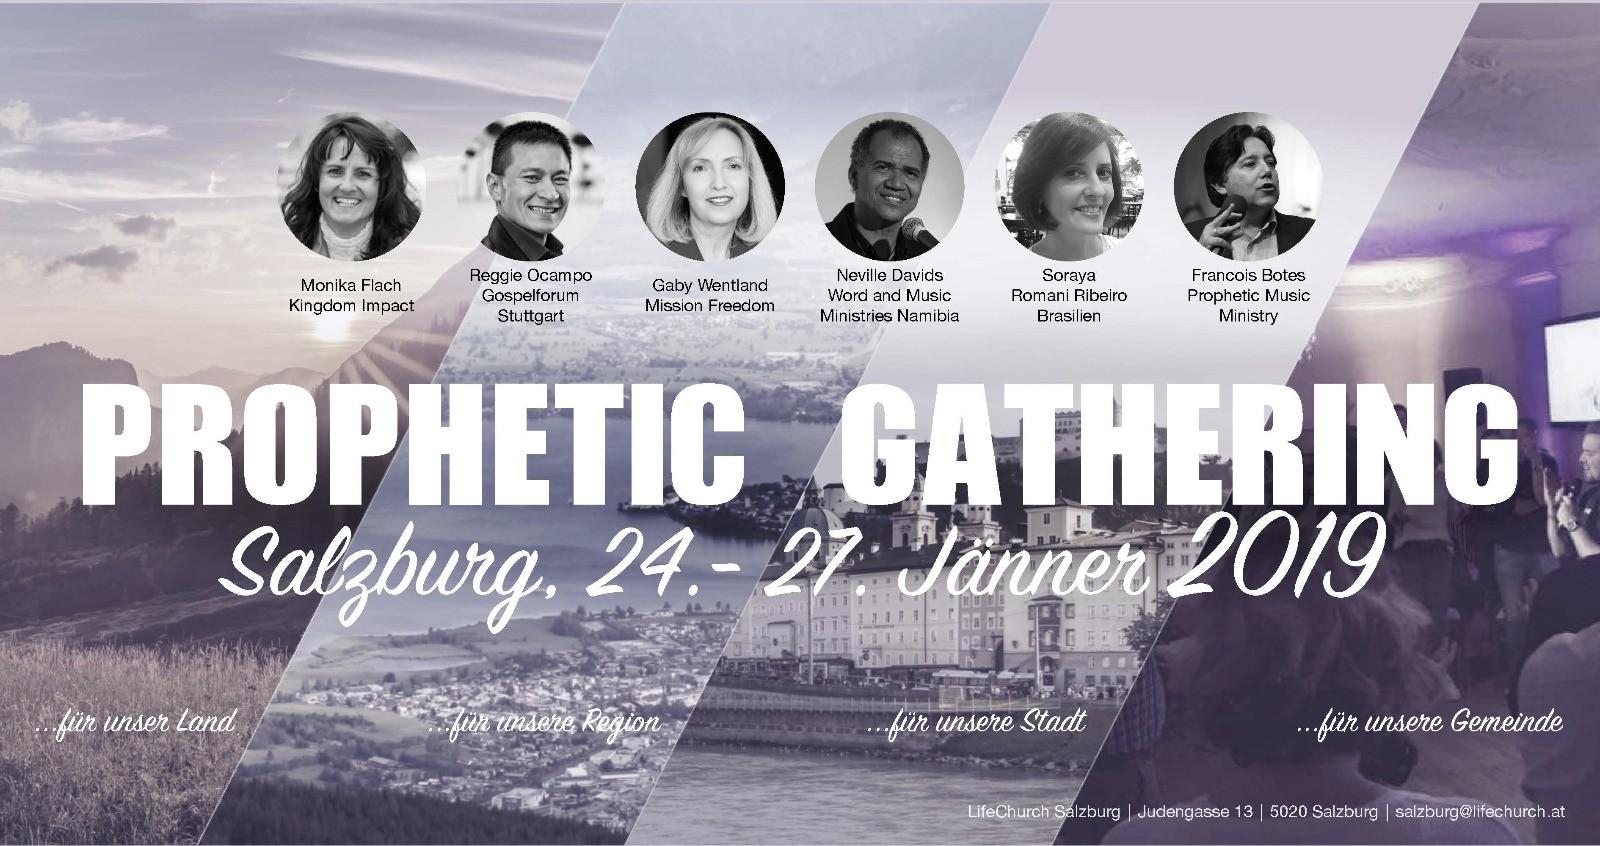 Prophetic Gathering 2019 Salzburg